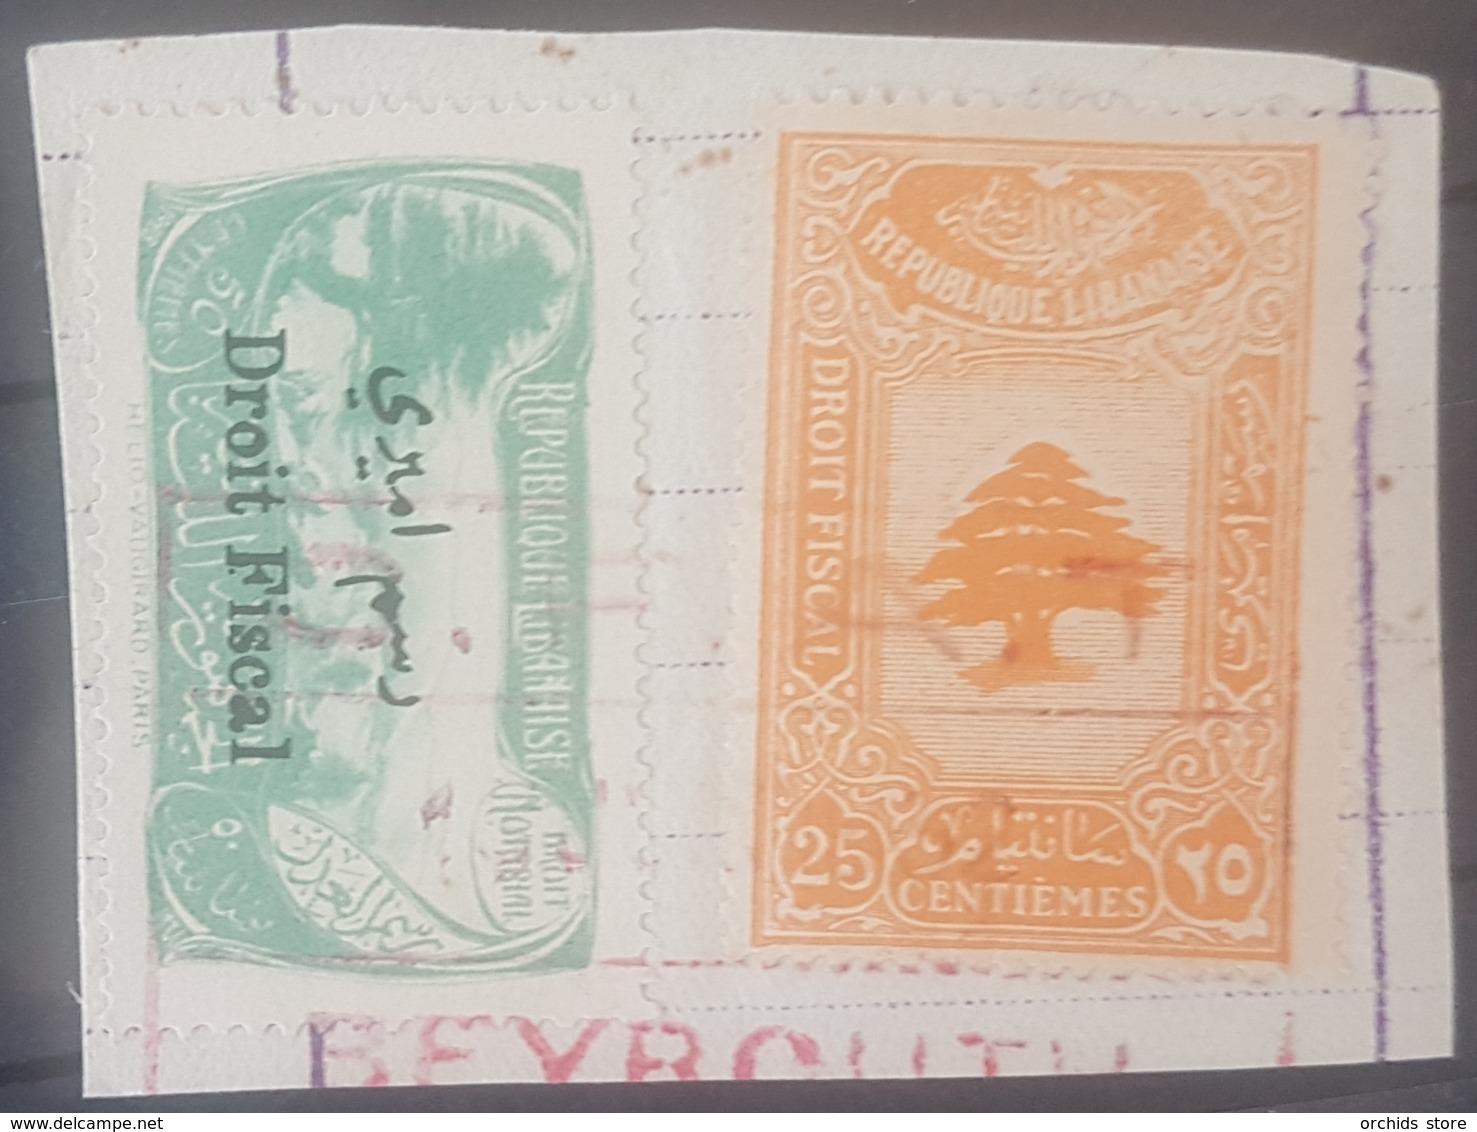 NO11 - Lebanon Cedar Design 20c & The Rare 25 Centiemes Ovpt On C.F.A.T Beyrouth Piece - Lebanon